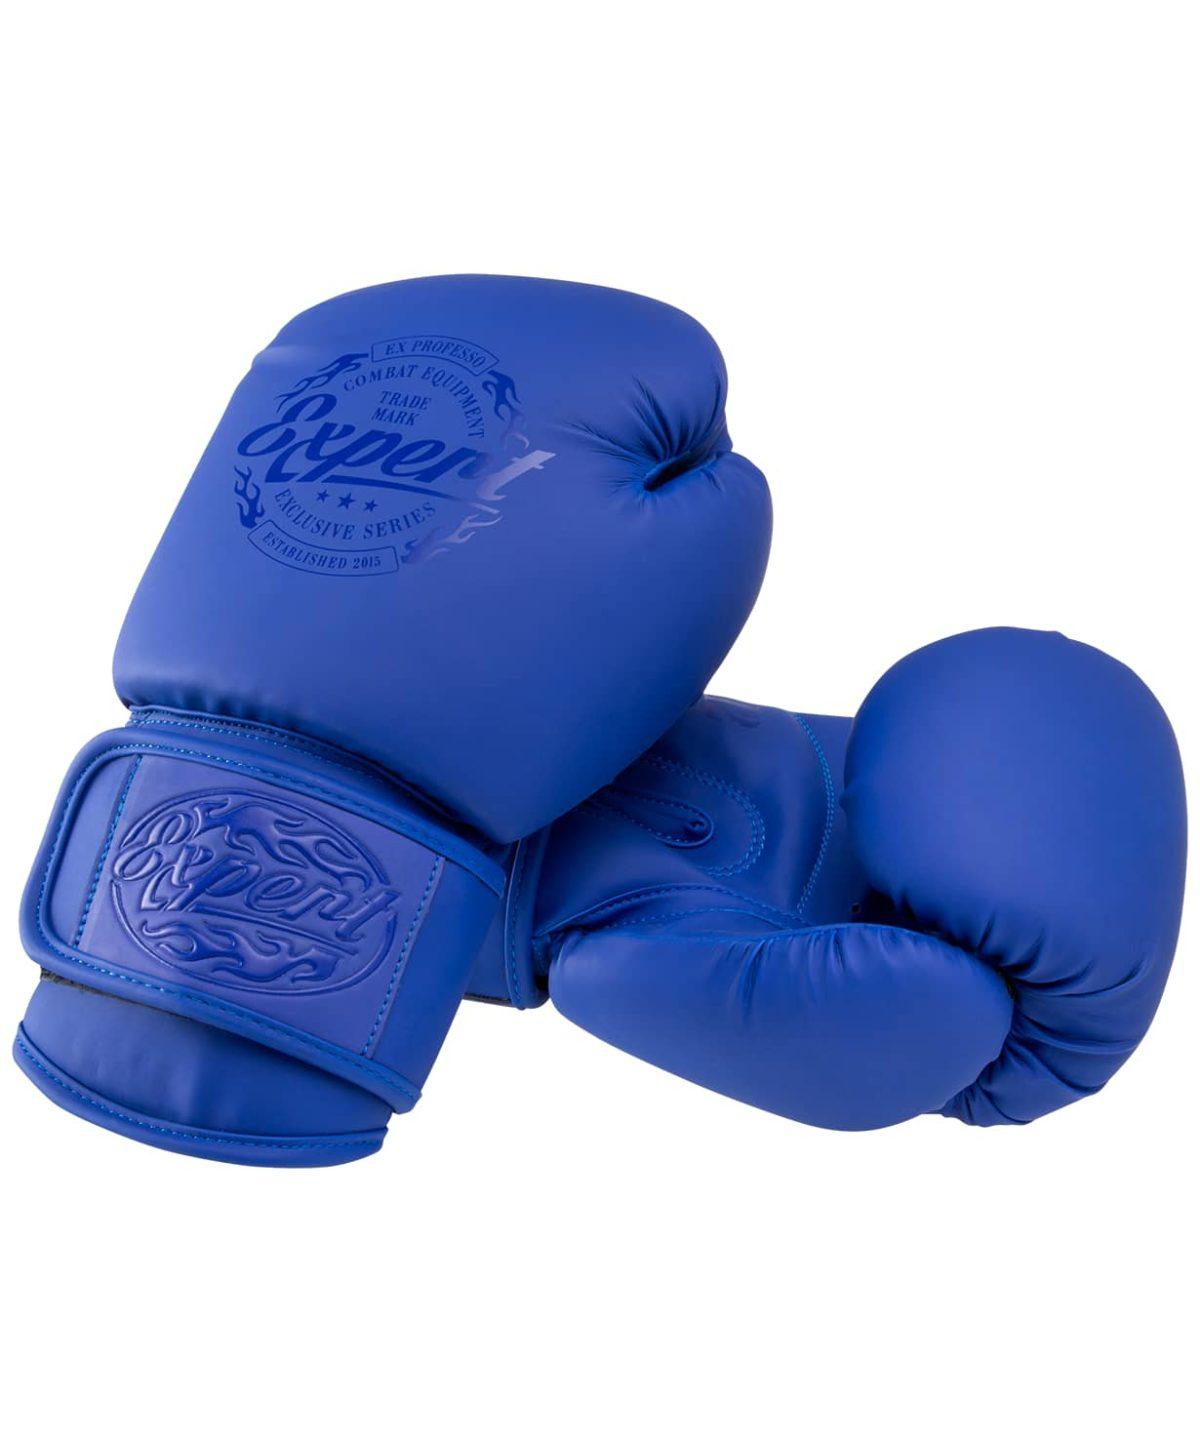 FIGHT EXPERT Перчатки боксерские 10 oz  BGS-V010: синий - 1